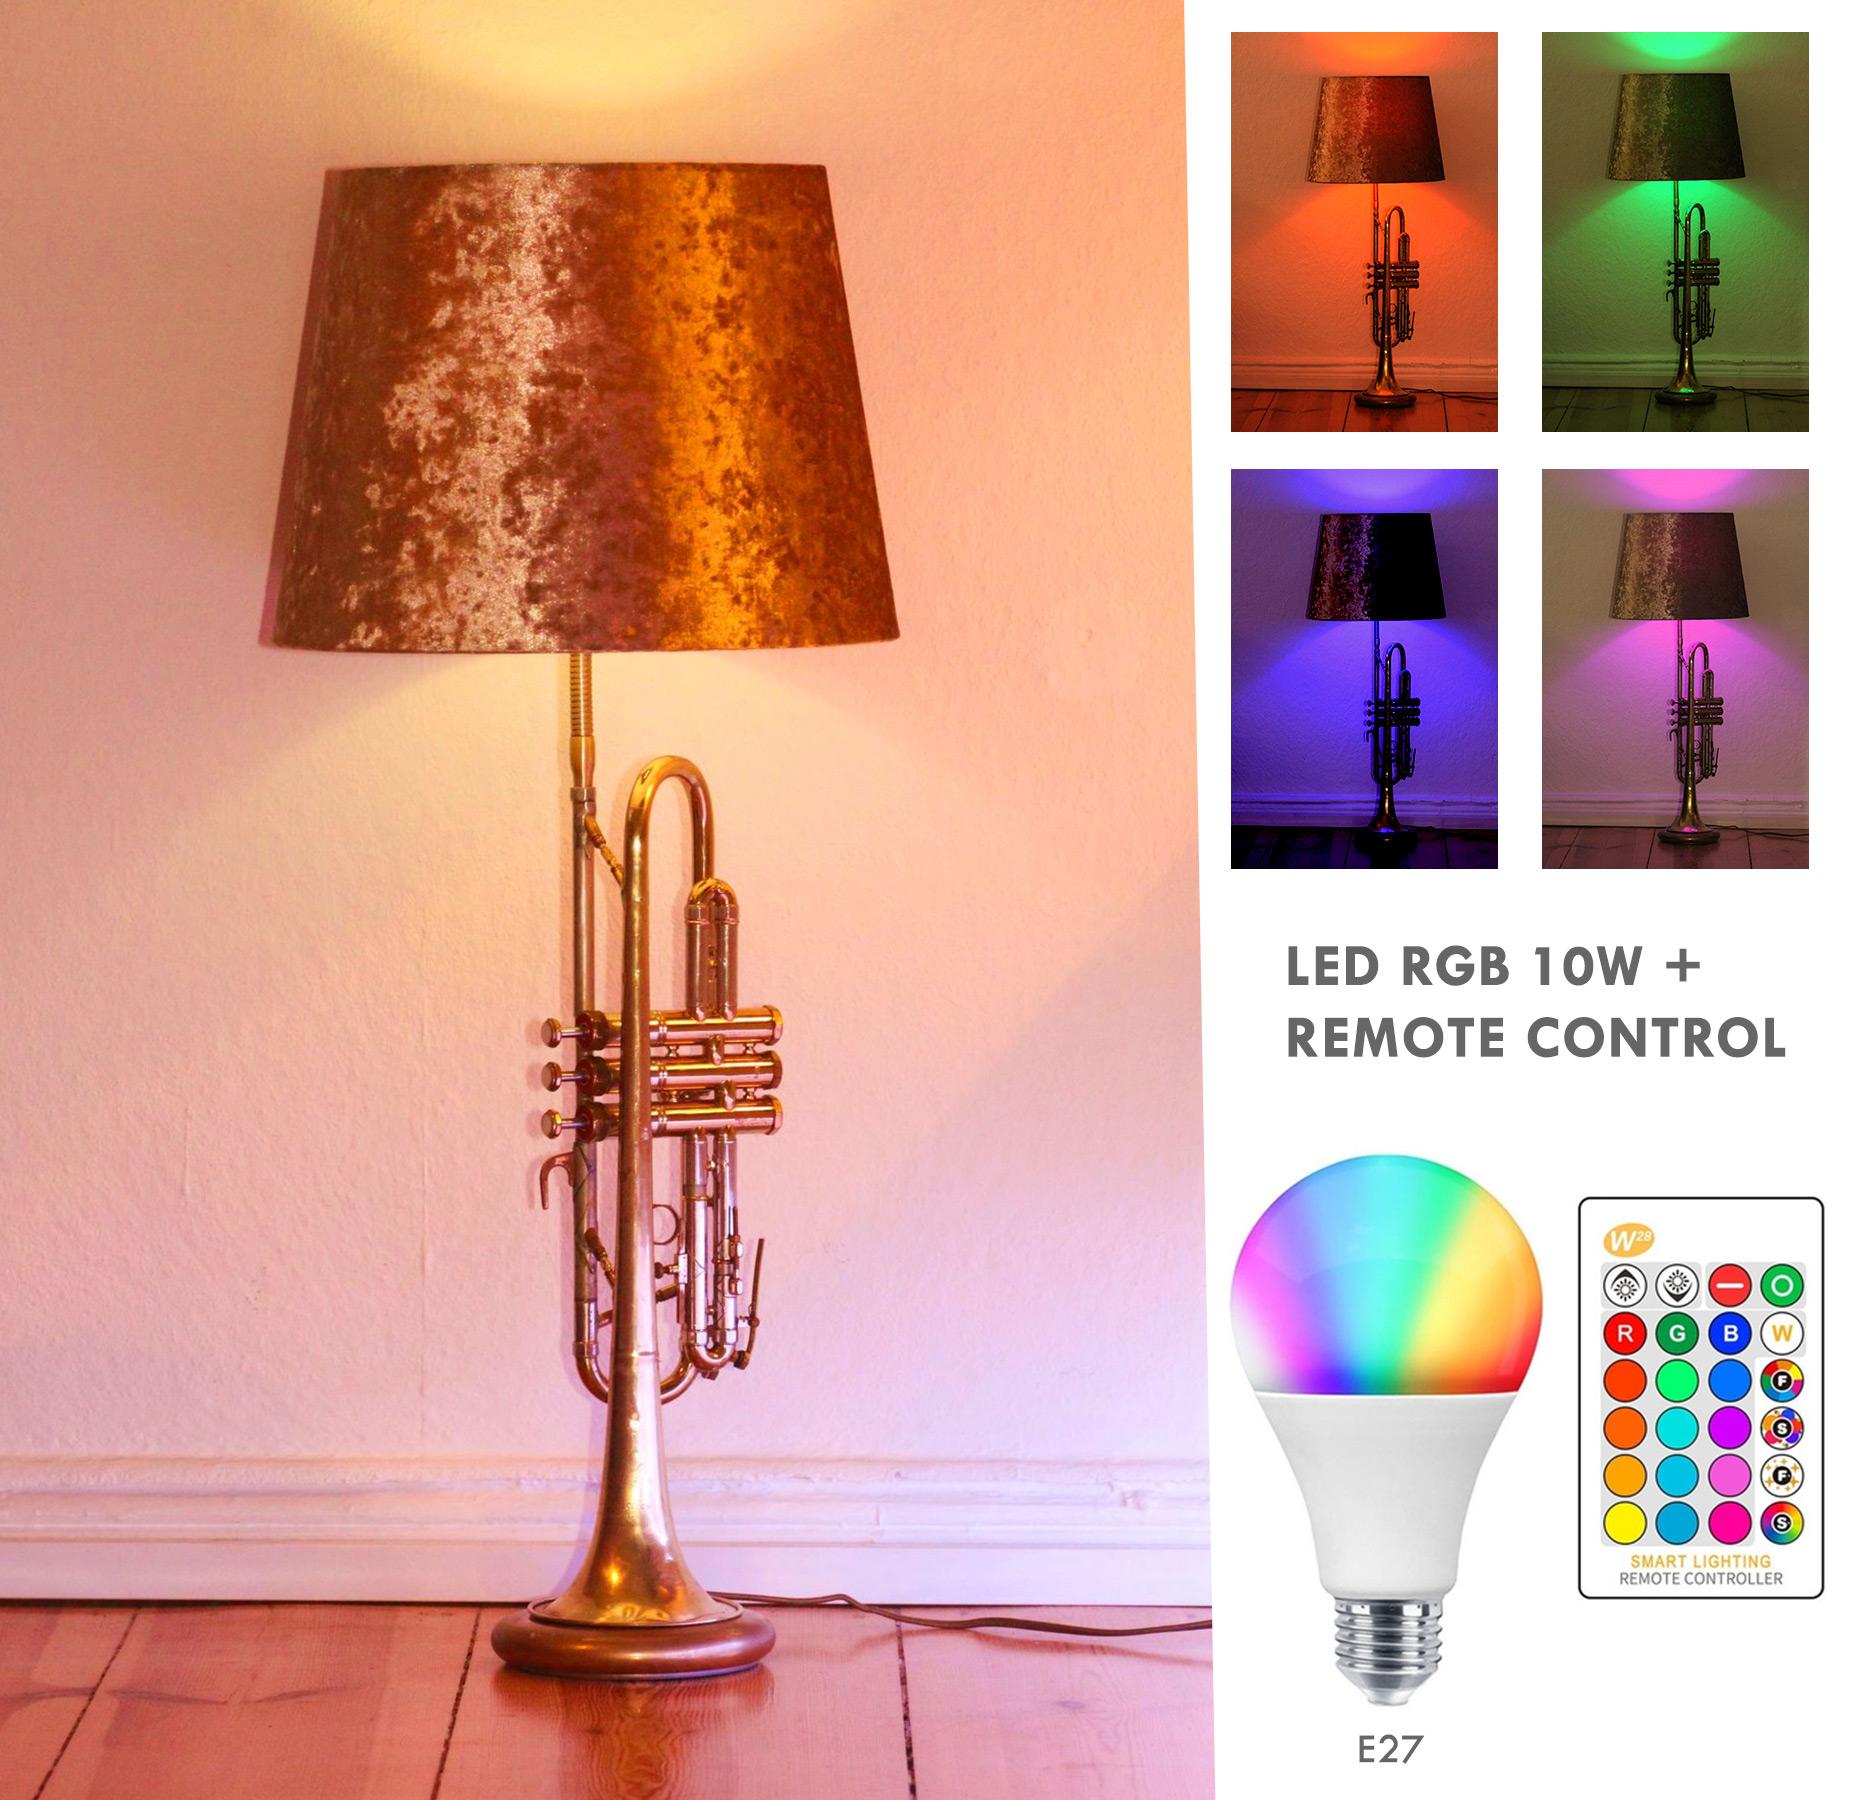 Trompetenlampe Stehlampe Gold LED (RGB) + Fernbedienung